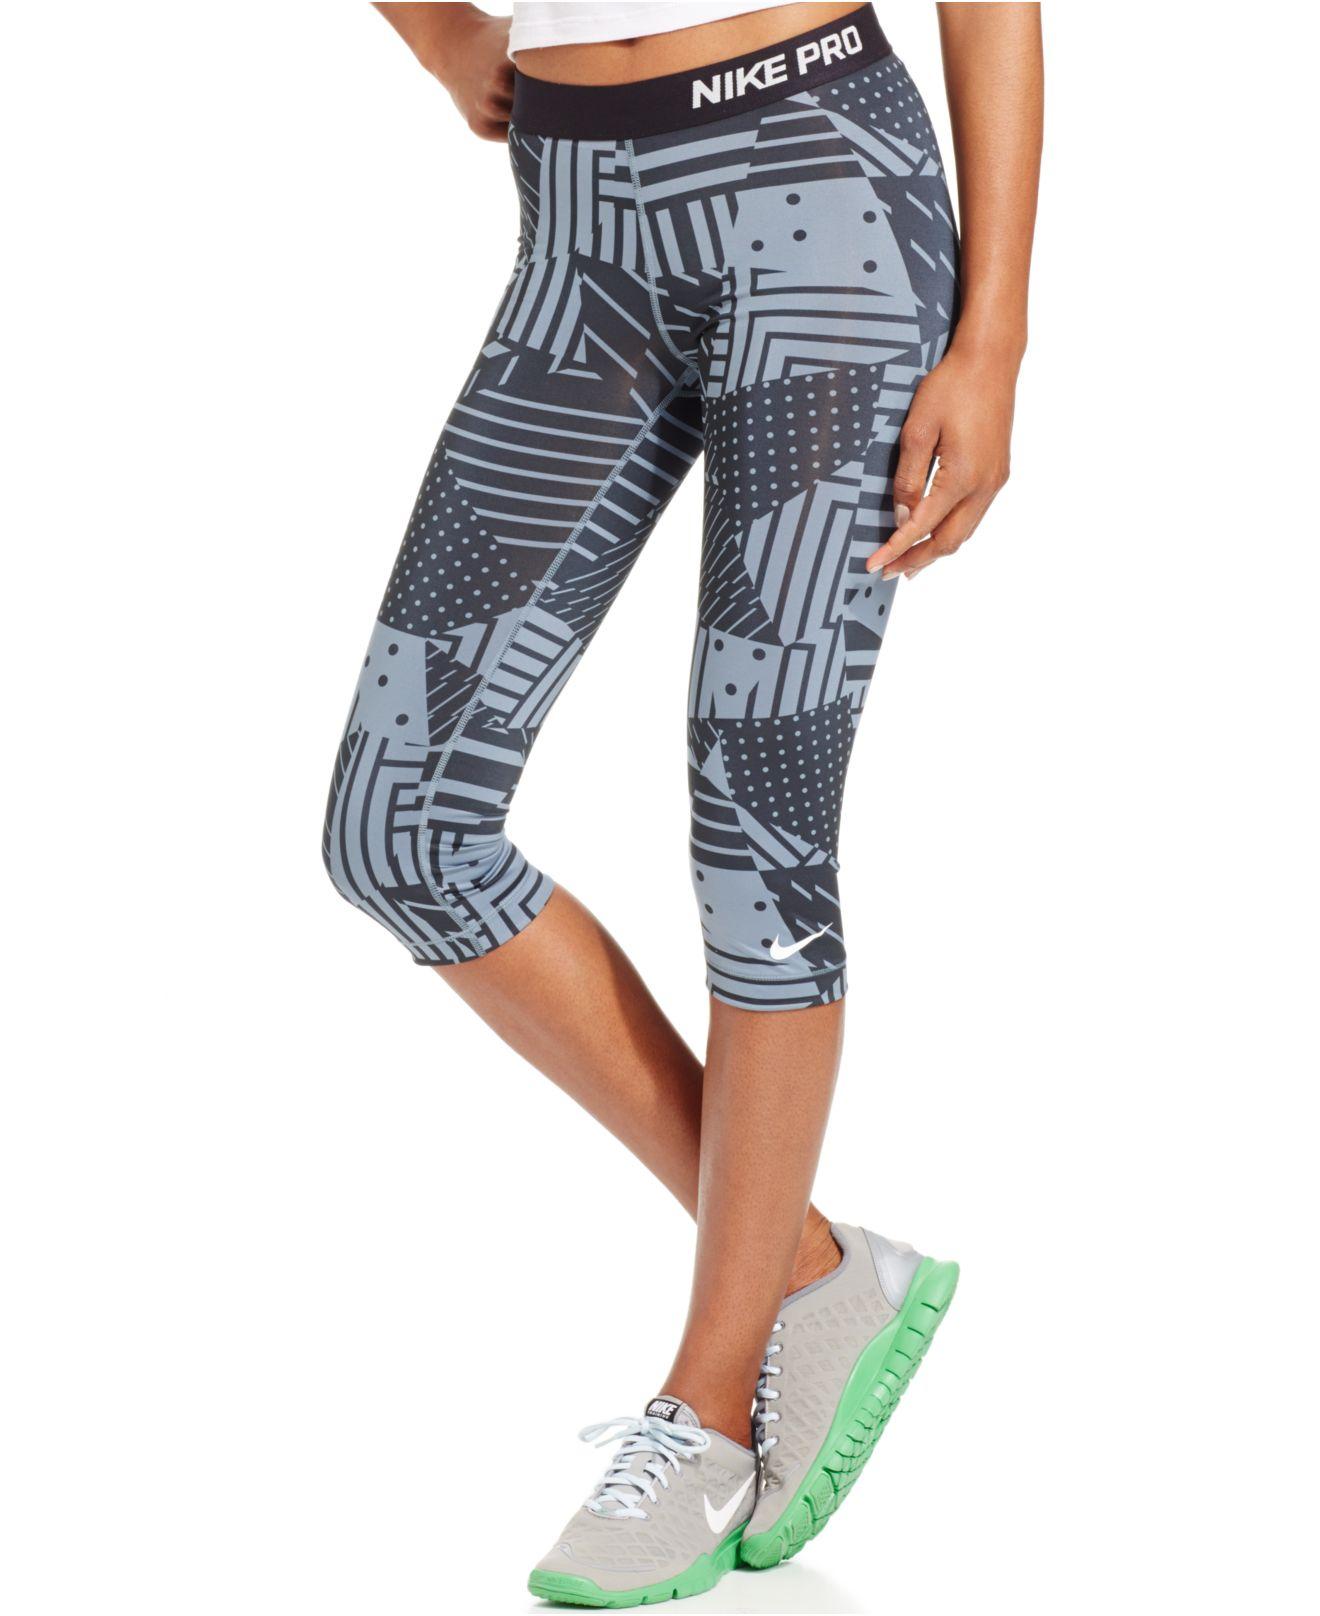 98ddb20de0f3 Lyst - Nike Pro Patchwork Printed Capri Leggings in Black